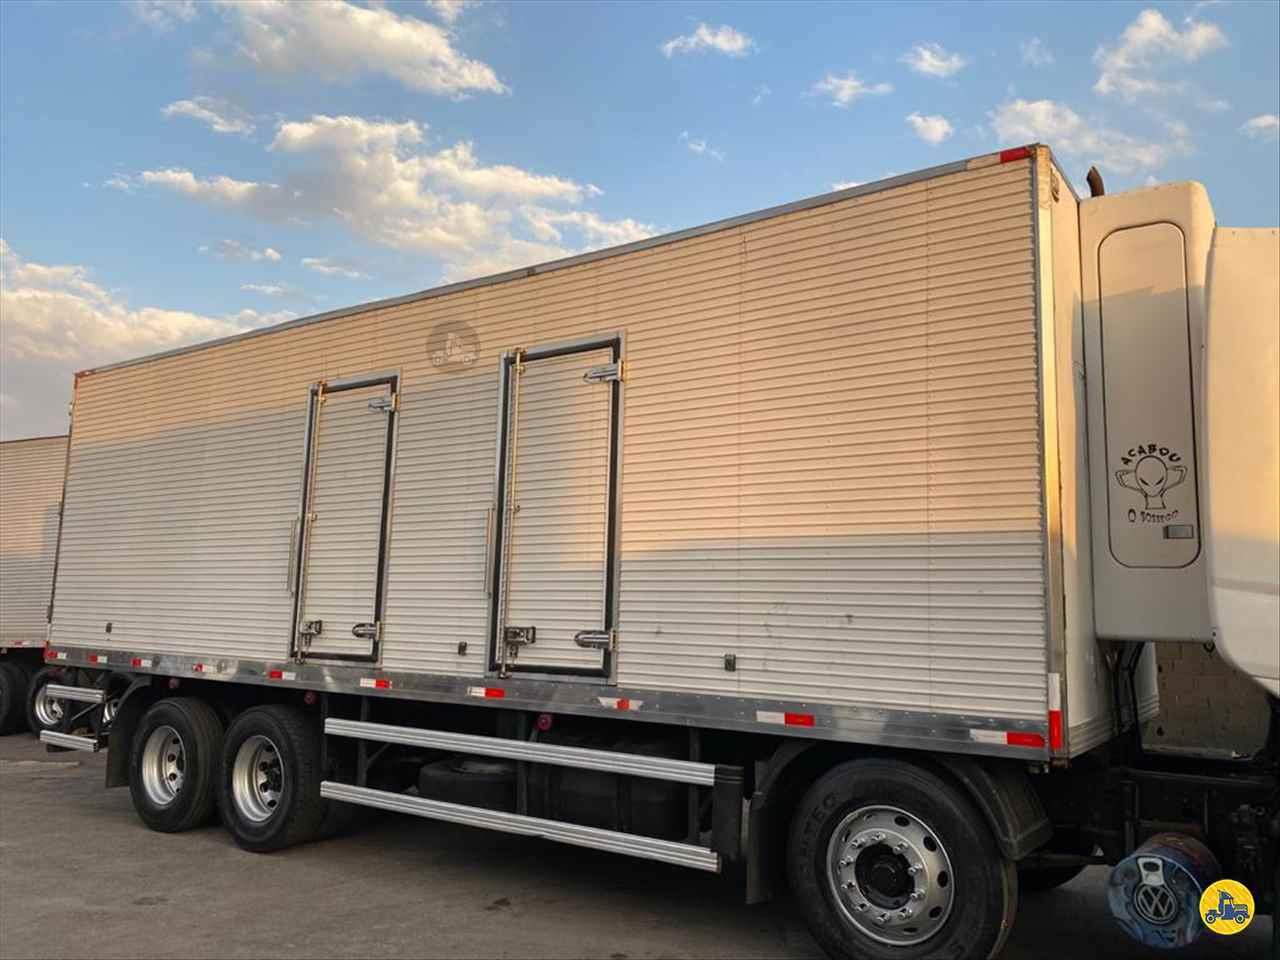 CARROCERIA SOBRE CHASSI  BITRUCK BAU FRIGORIFICO Authentic Trucks SAO PAULO SÃO PAULO SP